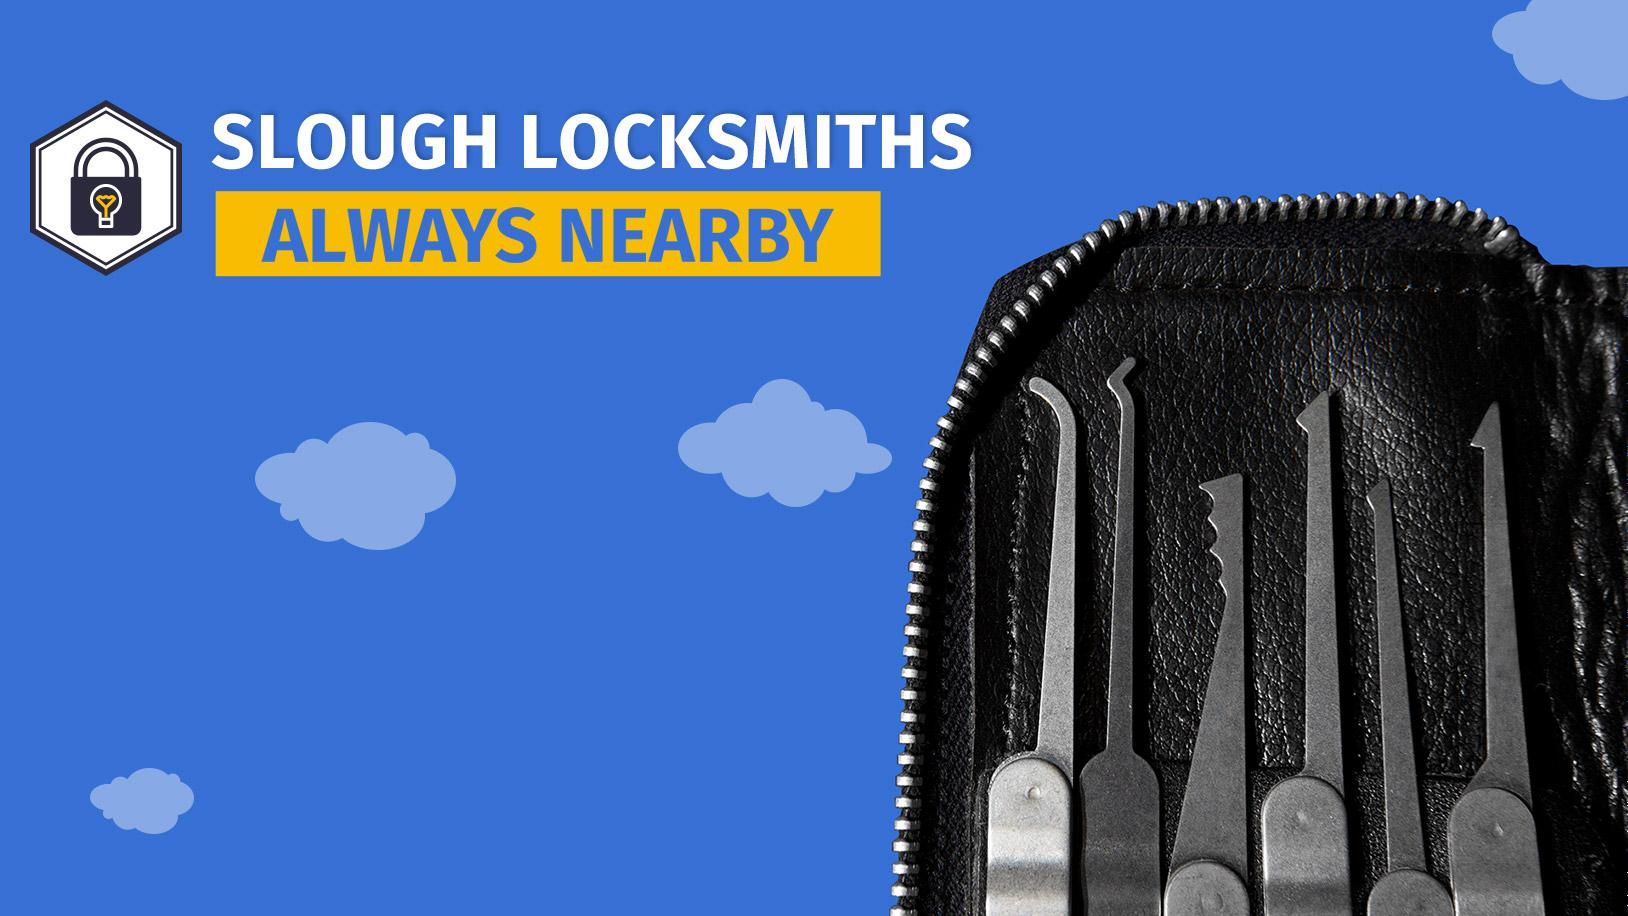 Logo of Slough Locksmiths